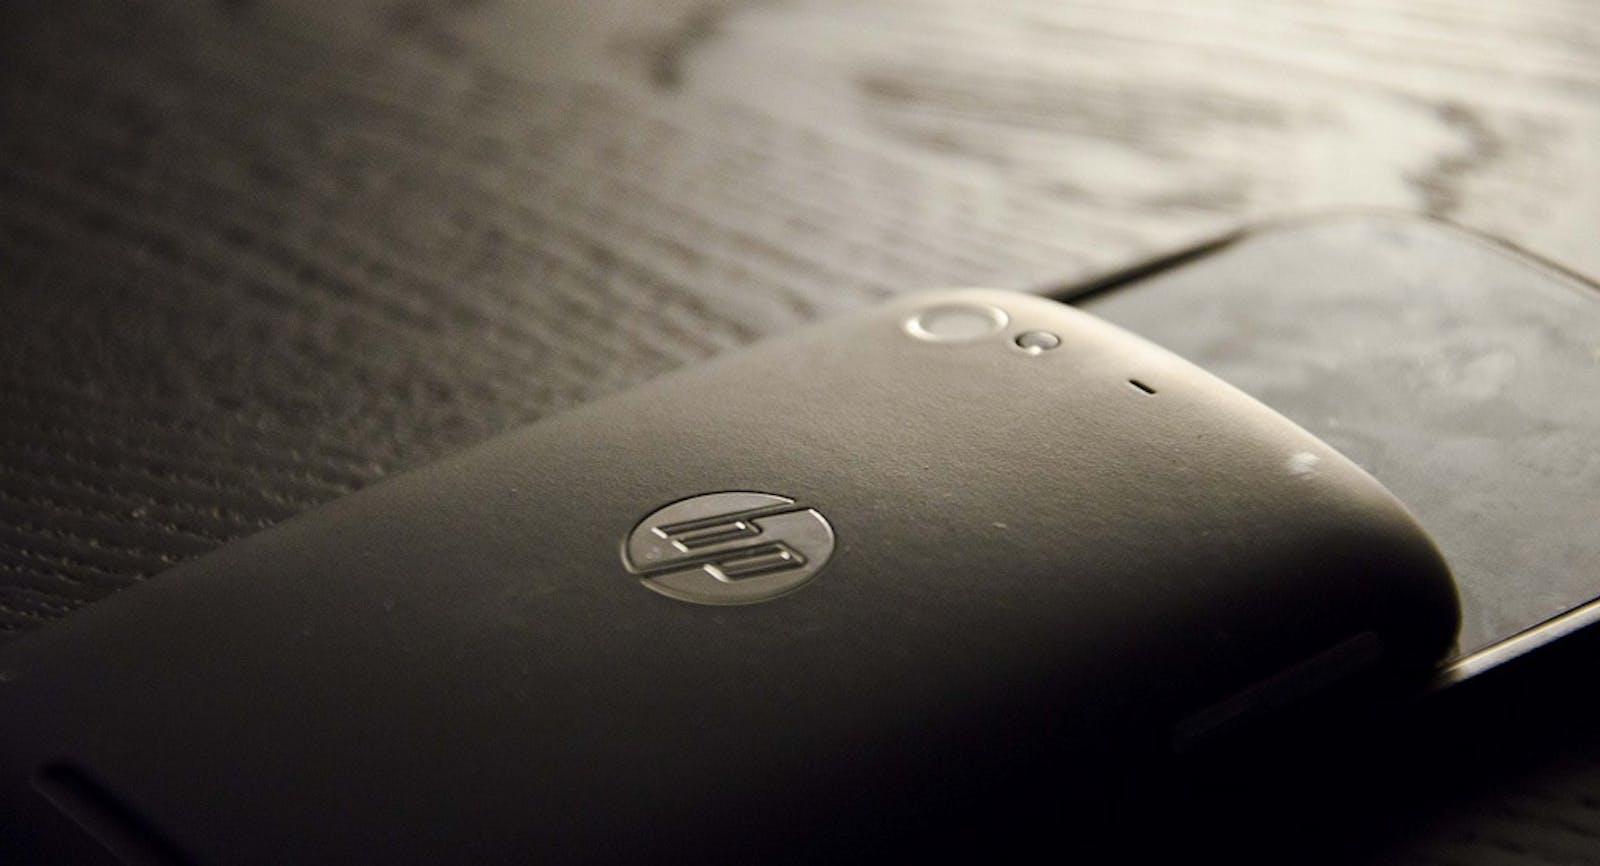 An HP Palm Pre, circa 2011. Credit: Ken Hawkins